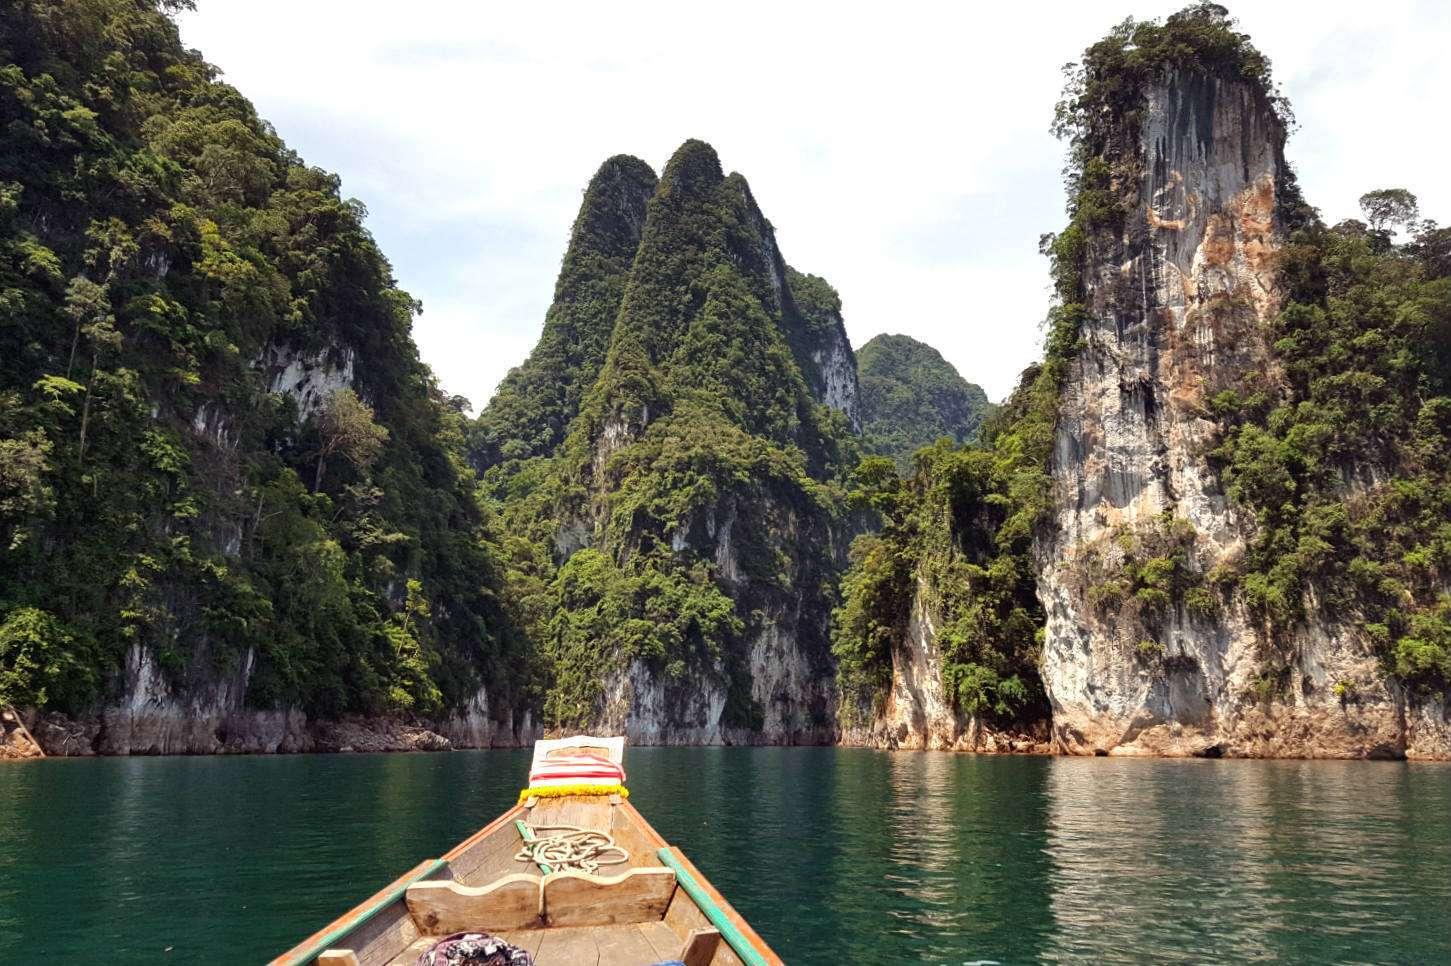 Limestone cliffs in Cheow Lan Lake